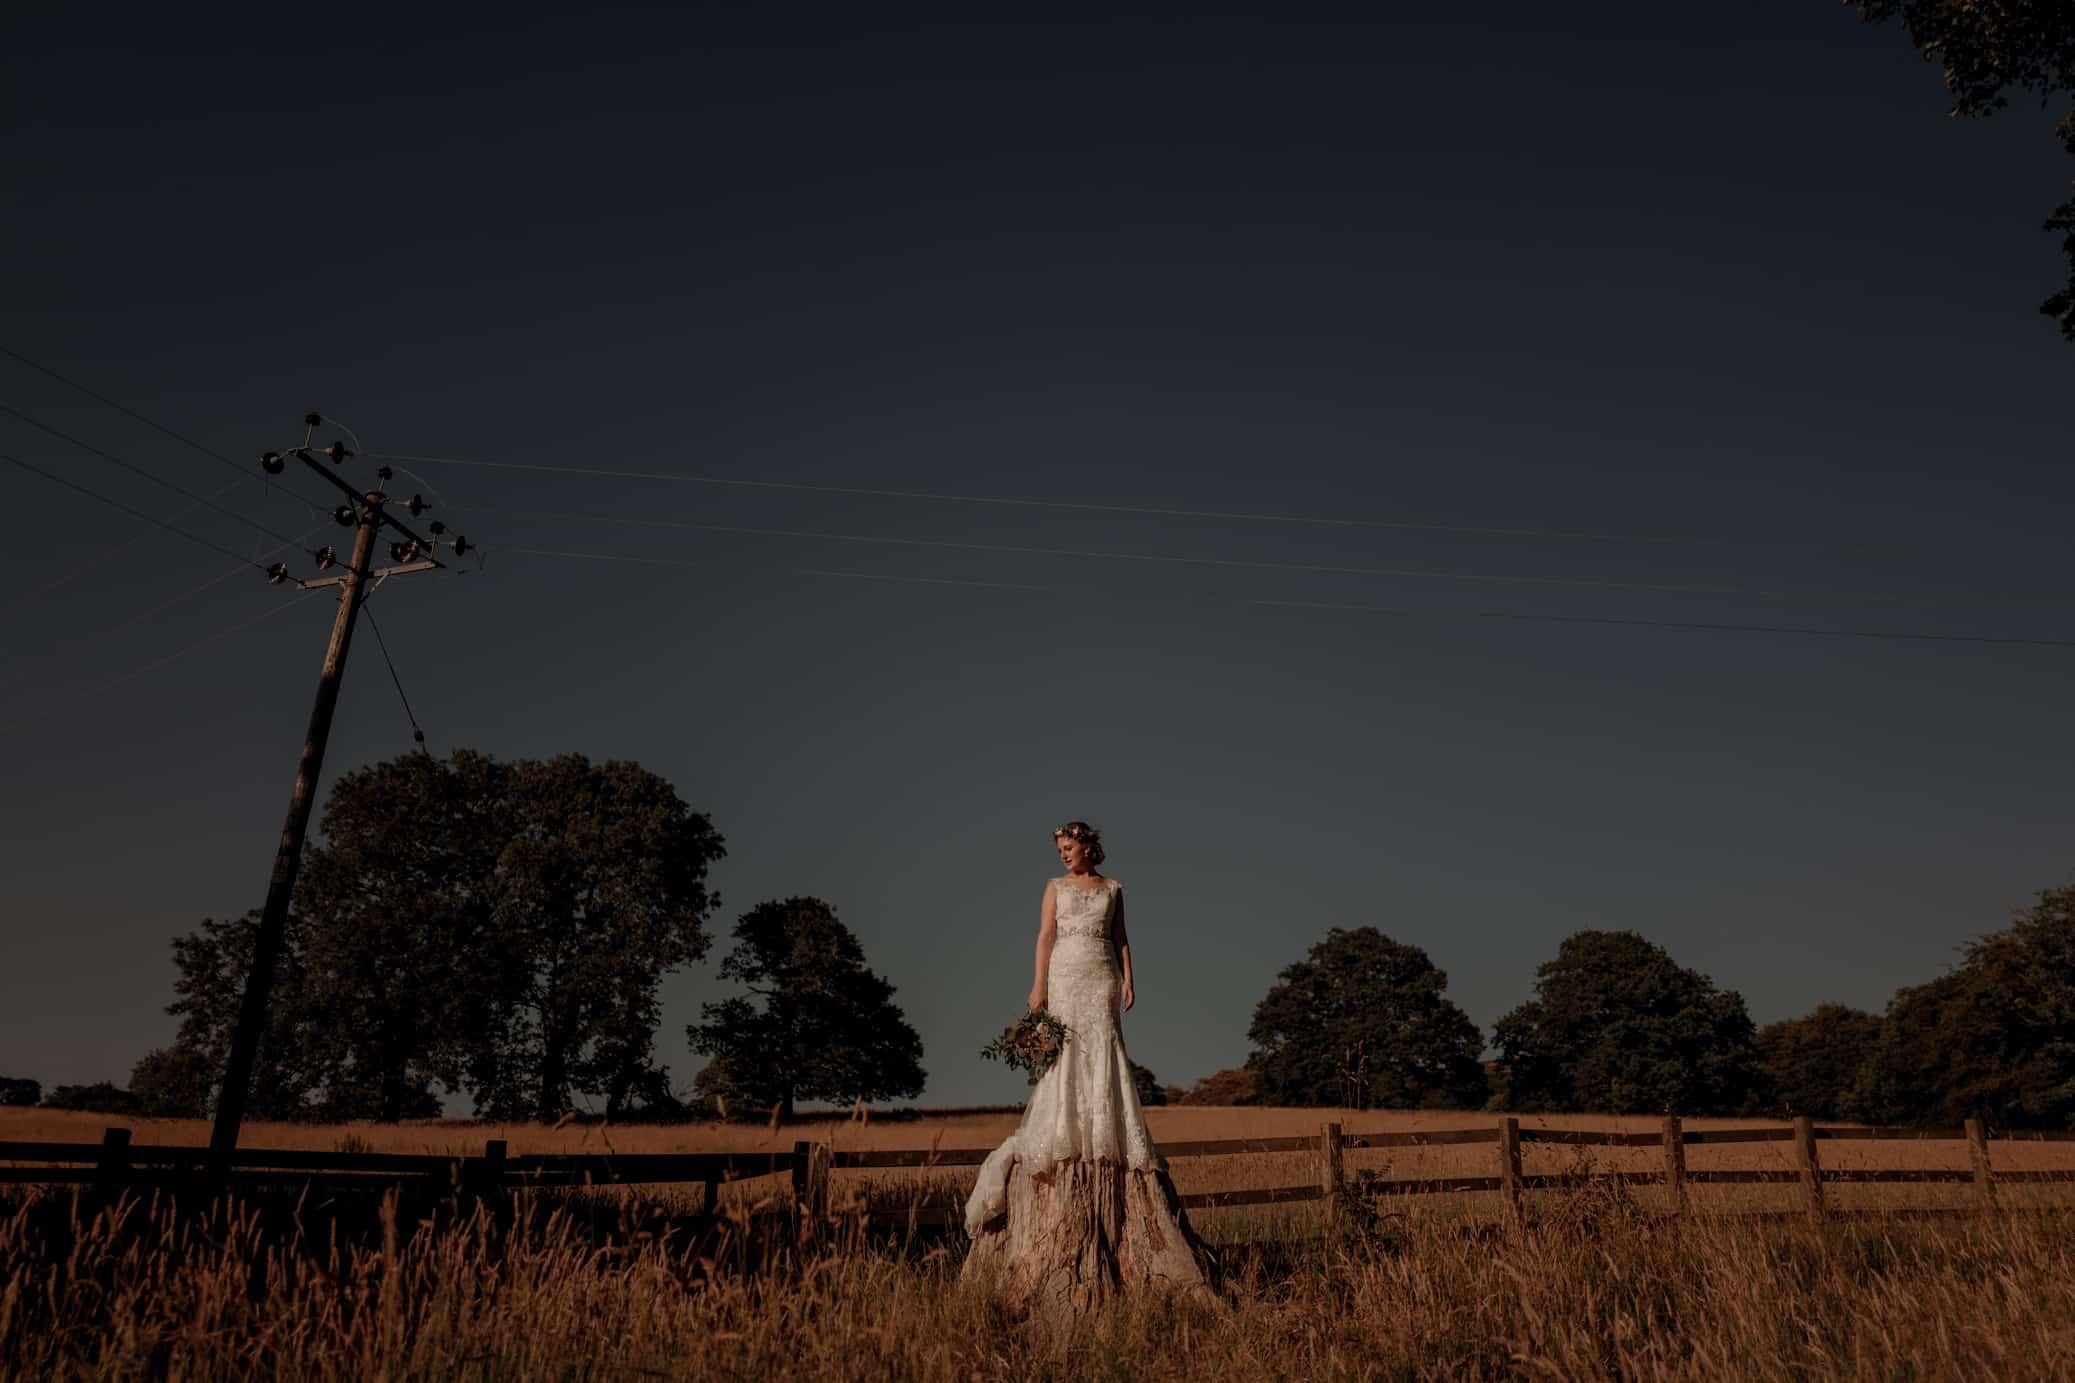 Golden Light wedding portrait of bride